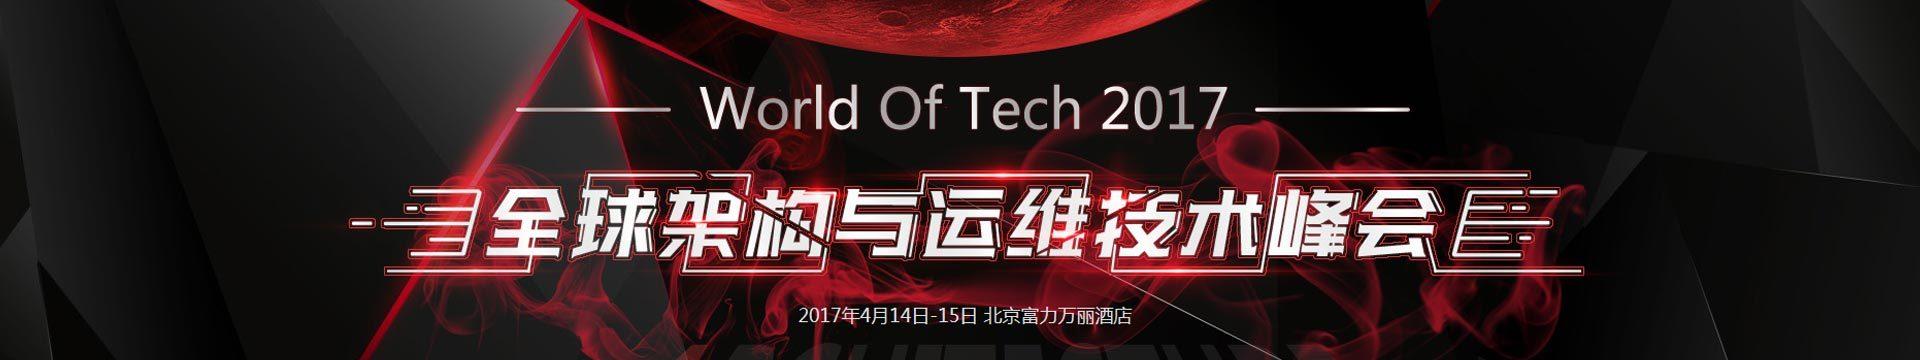 WOT 2017全球架构与运维技术峰会( World Of Tech 2017 )